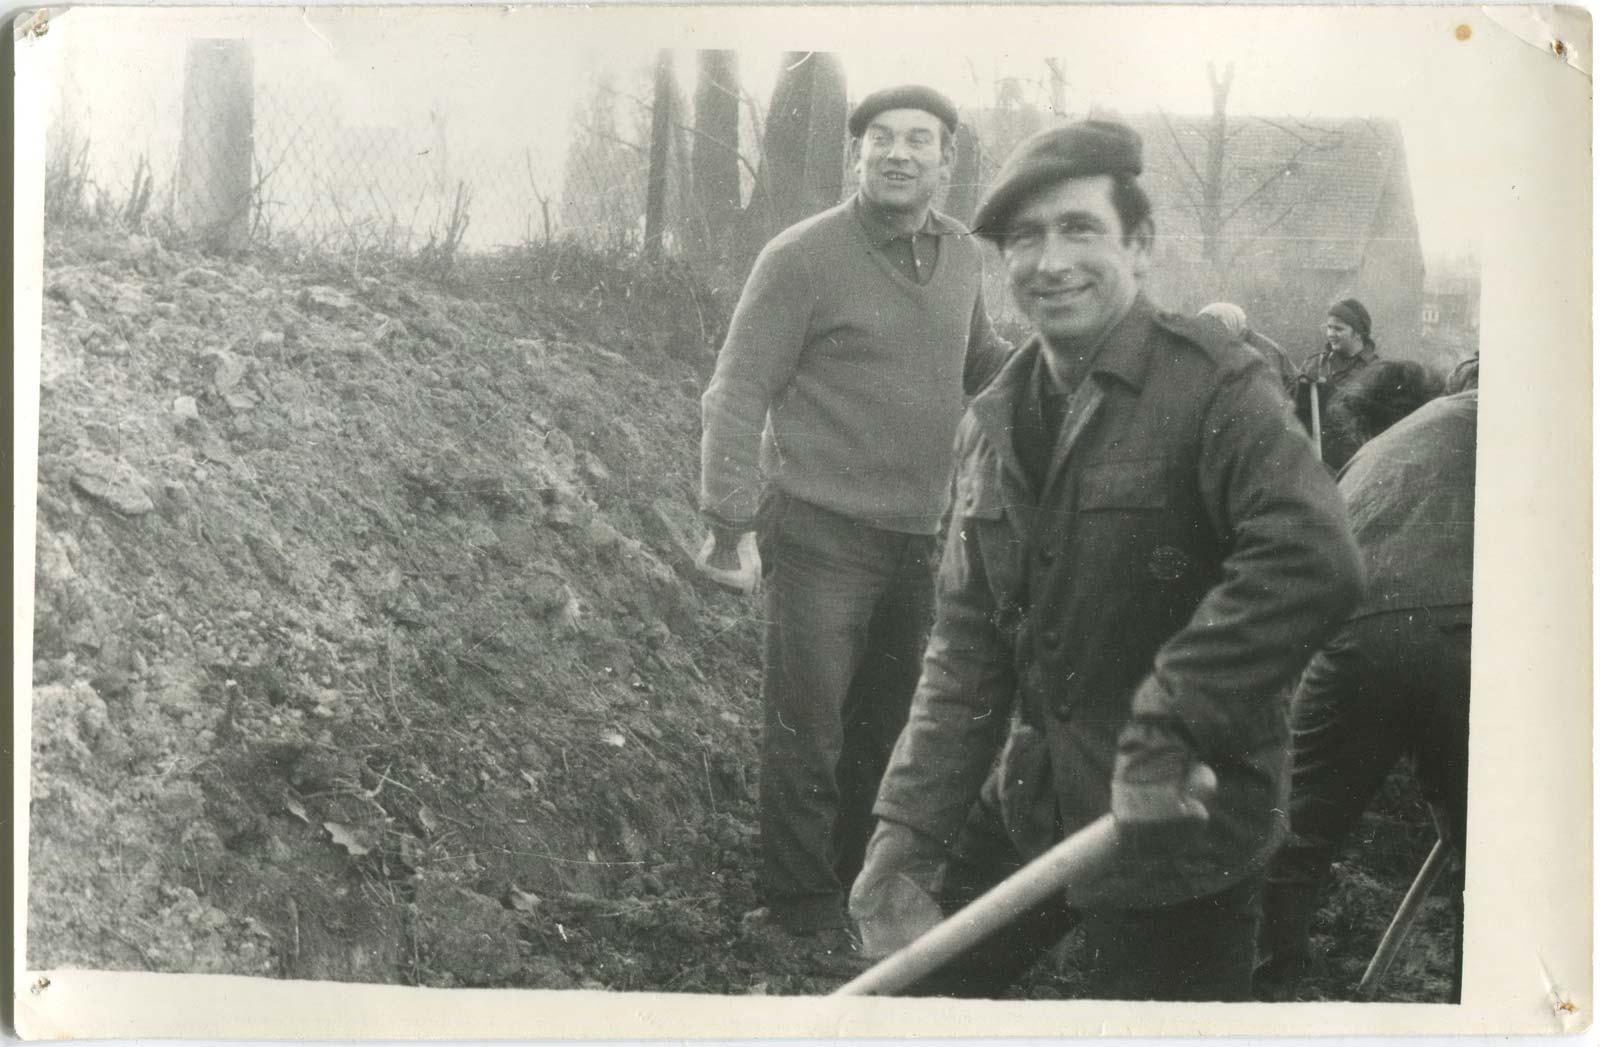 Budowa strażnicy OSP Kórnik - równanie terenu - 1974 rok